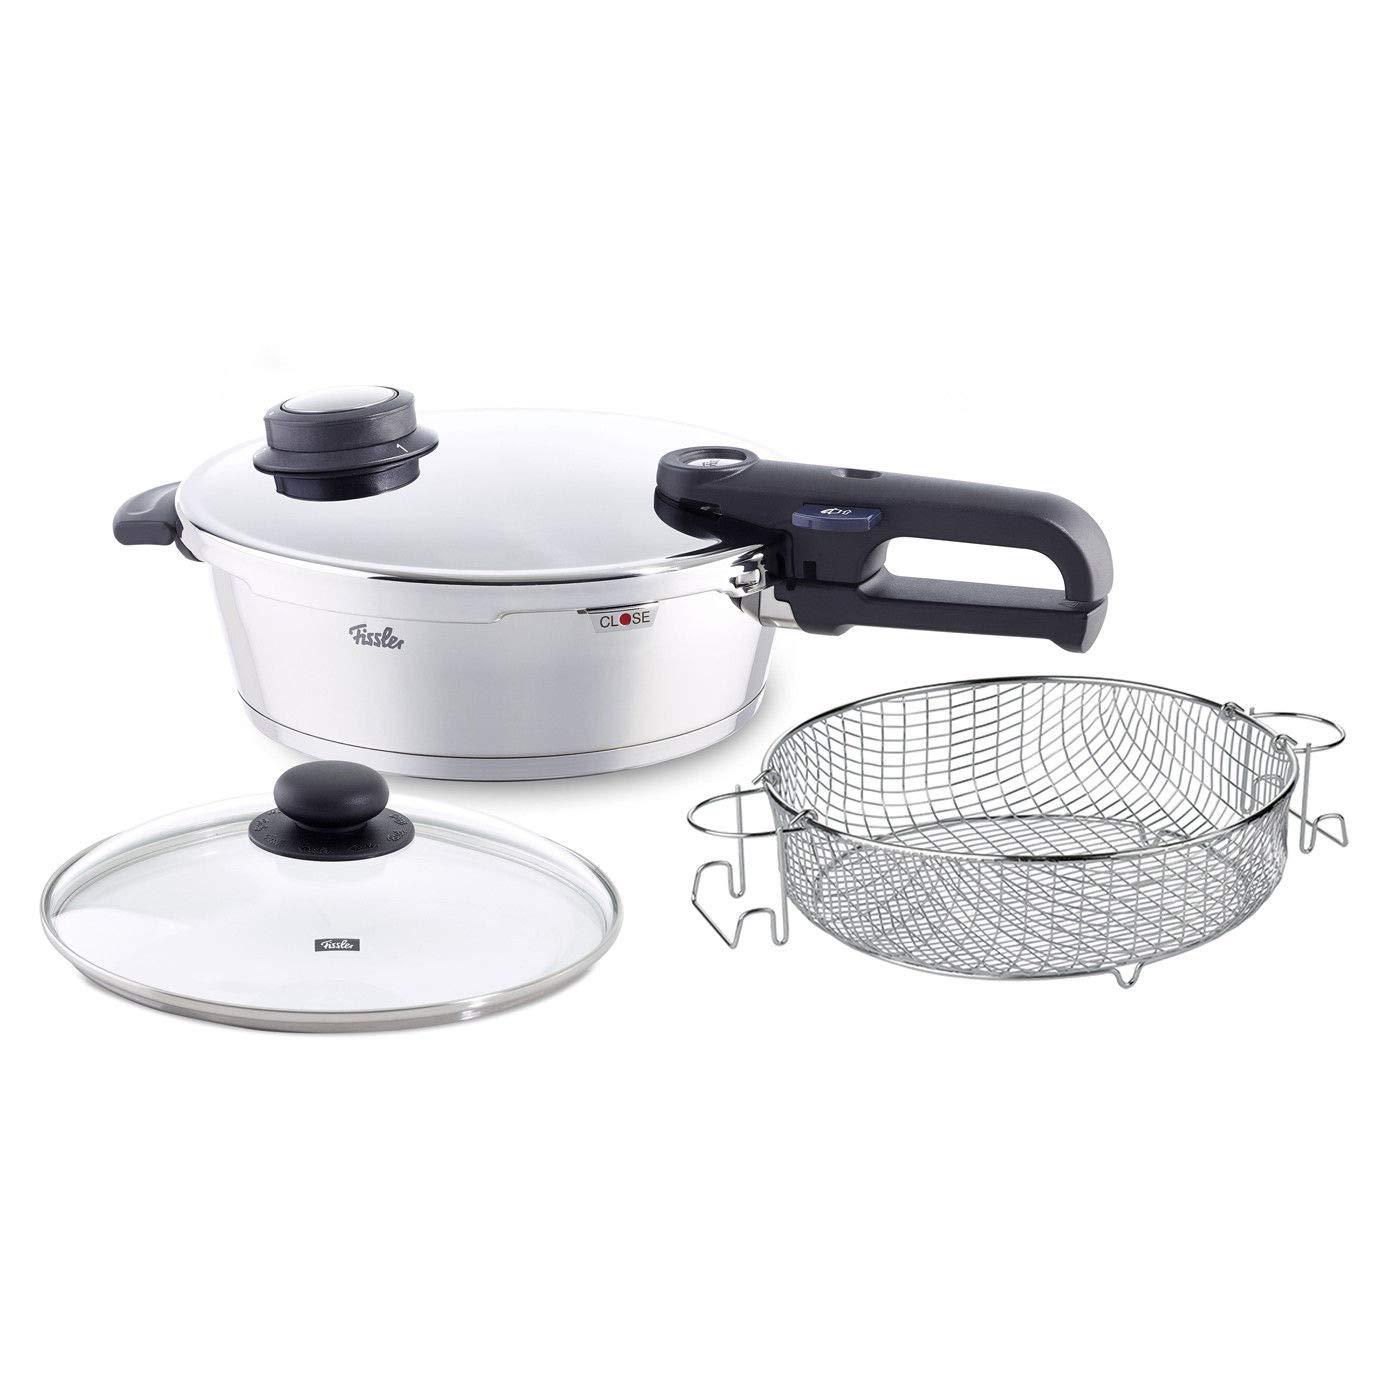 Fissler 4.2-Quart Vitavit Premium 4-Piece Pressure Cooker Set by Fissler (Image #1)